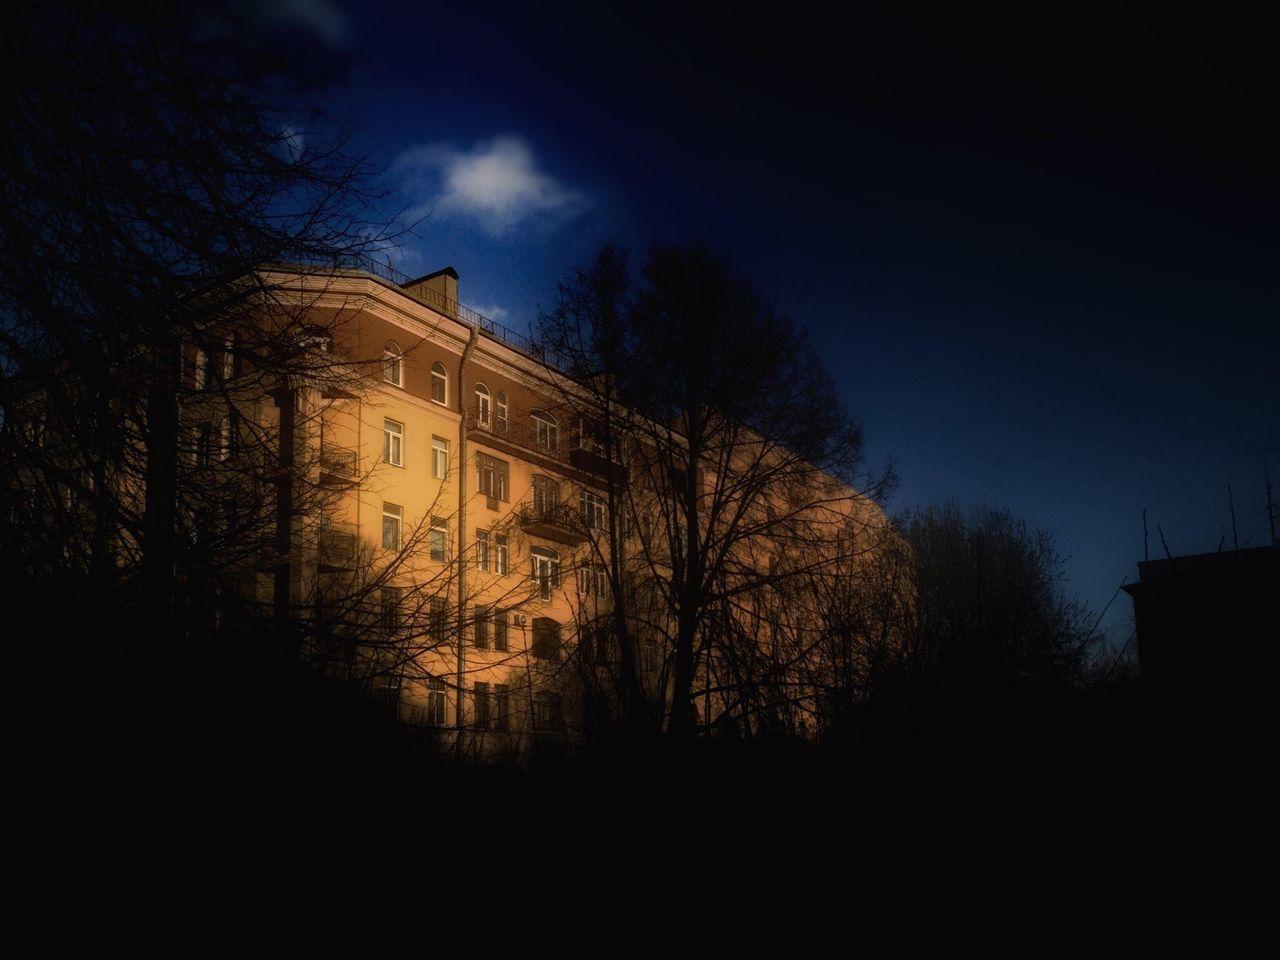 Building Behind Trees At Night